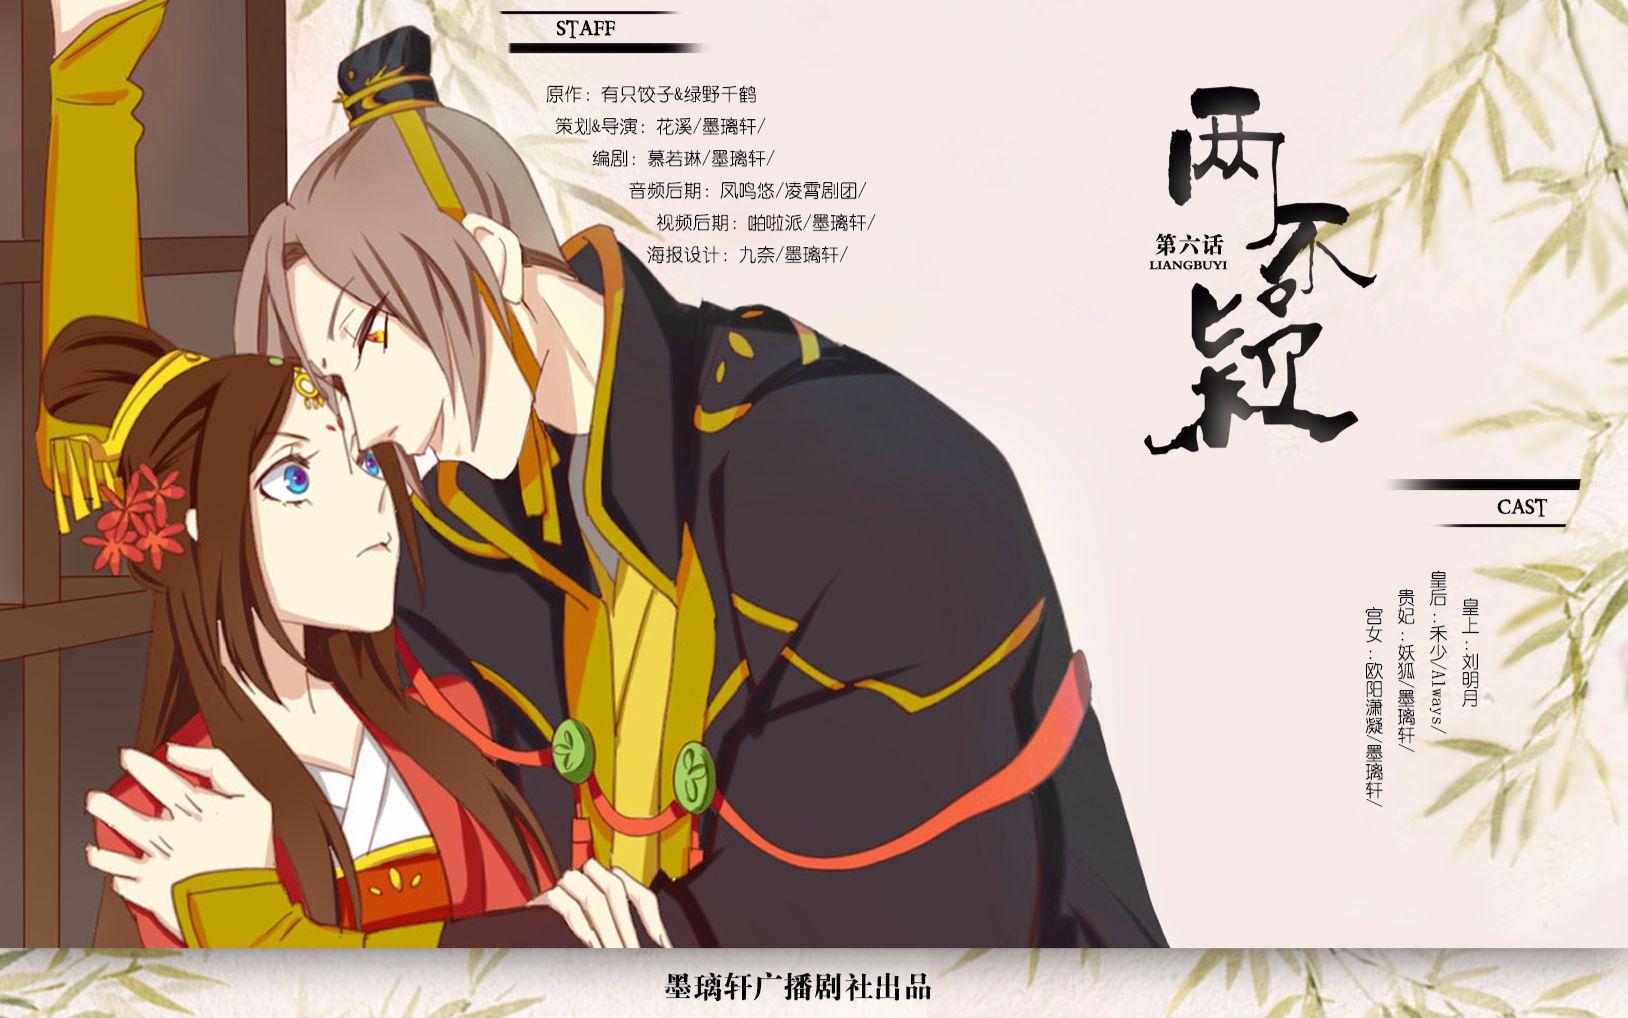 【動態漫畫】《兩不疑》第六話:皇上臨幸皇后了? - 墨璃軒出品_嗶哩嗶哩 (゜-゜)つロ 干杯~-bilibili